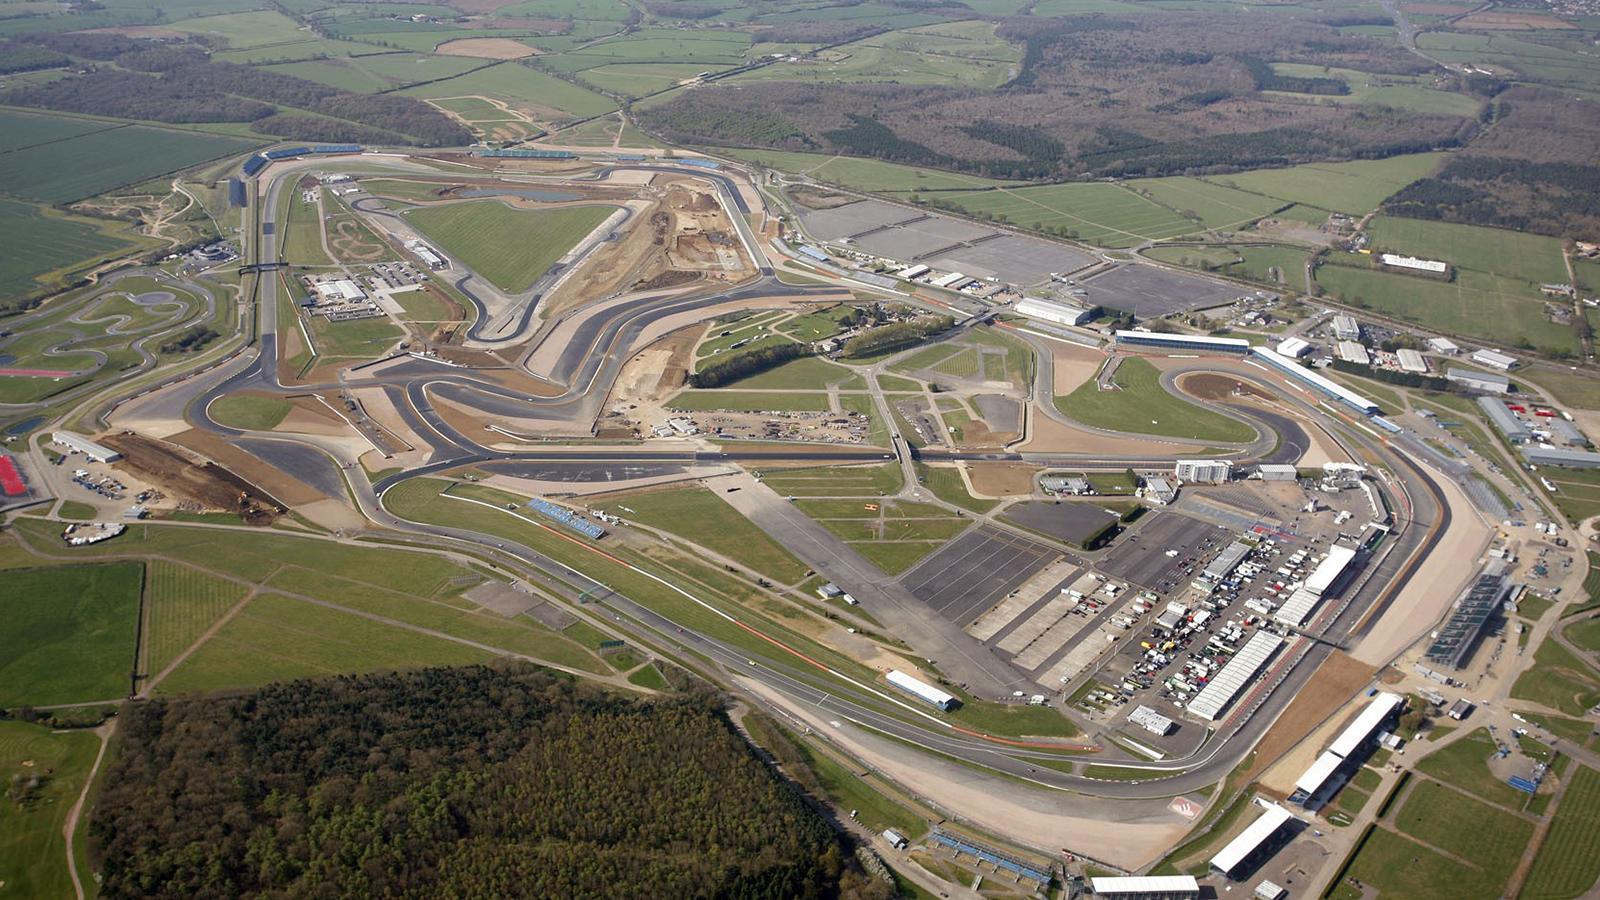 Silverstone, England - Round Five, 11 - 13 October 2019, Silverstone, England.Pure McLaren GT Series> Watch live on TSL